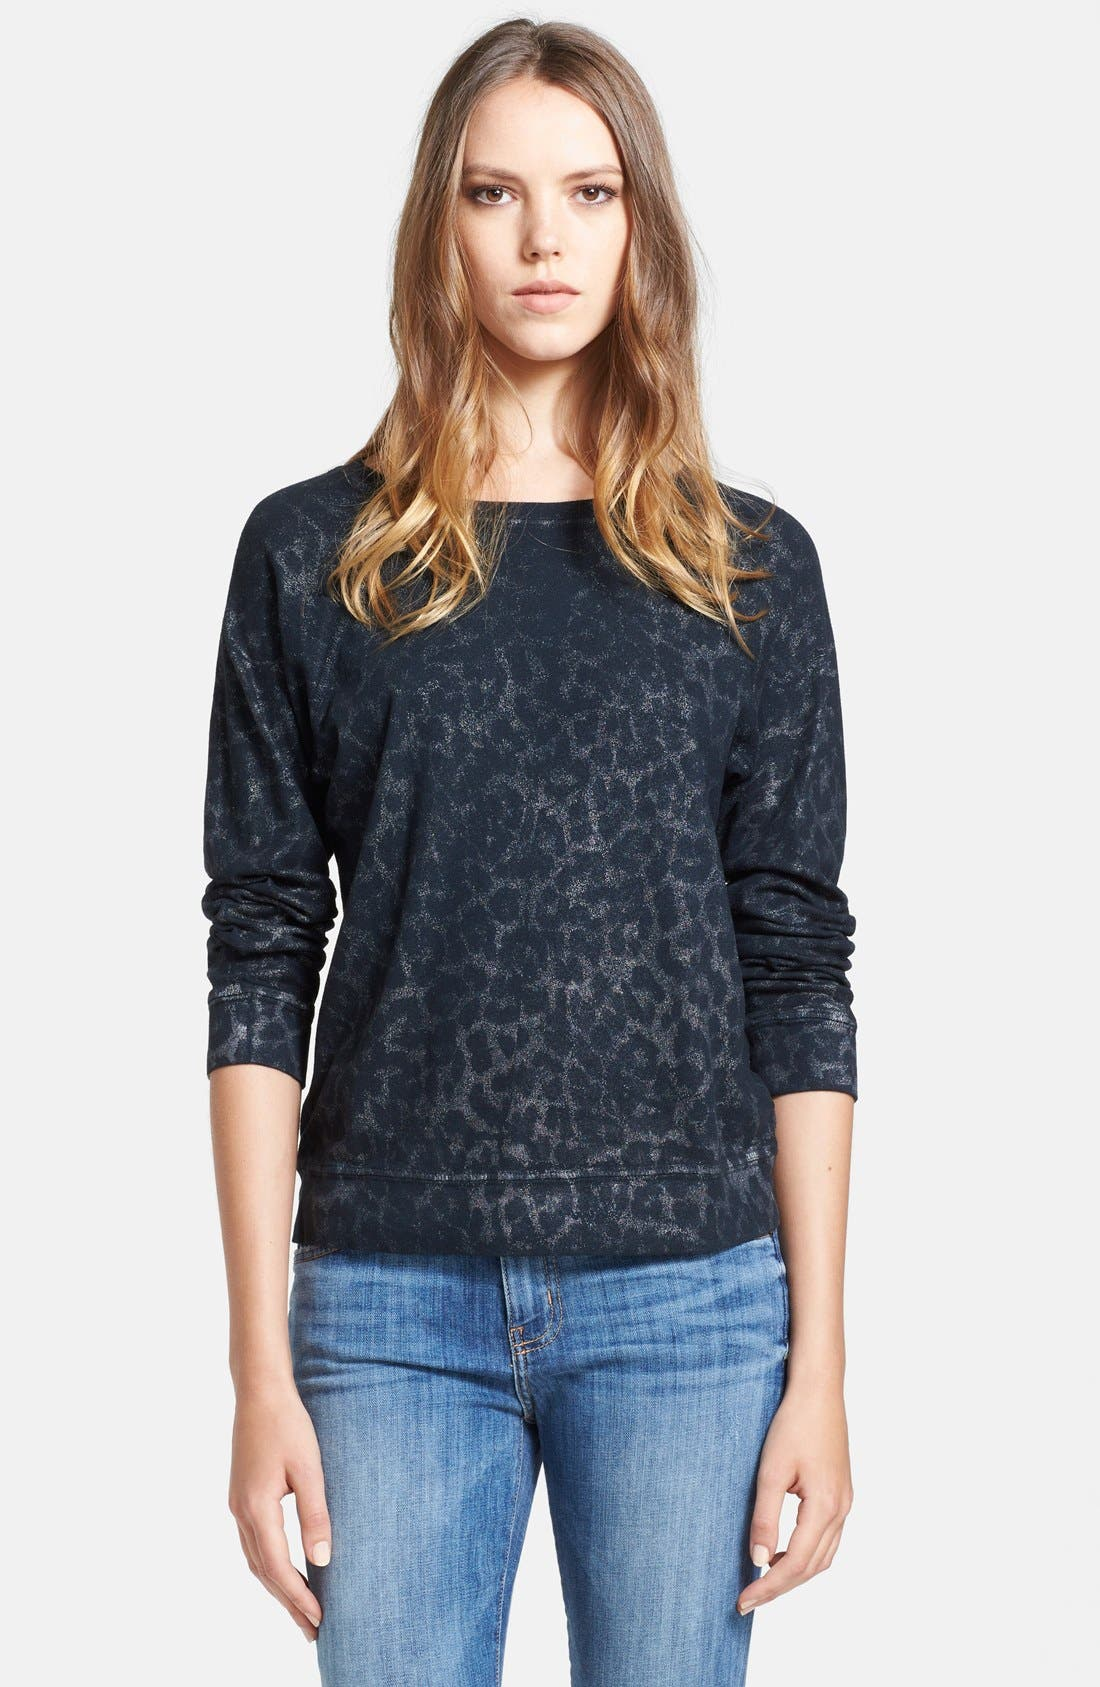 Main Image - Current/Elliott 'The Letterman' Print Destroyed Sweatshirt